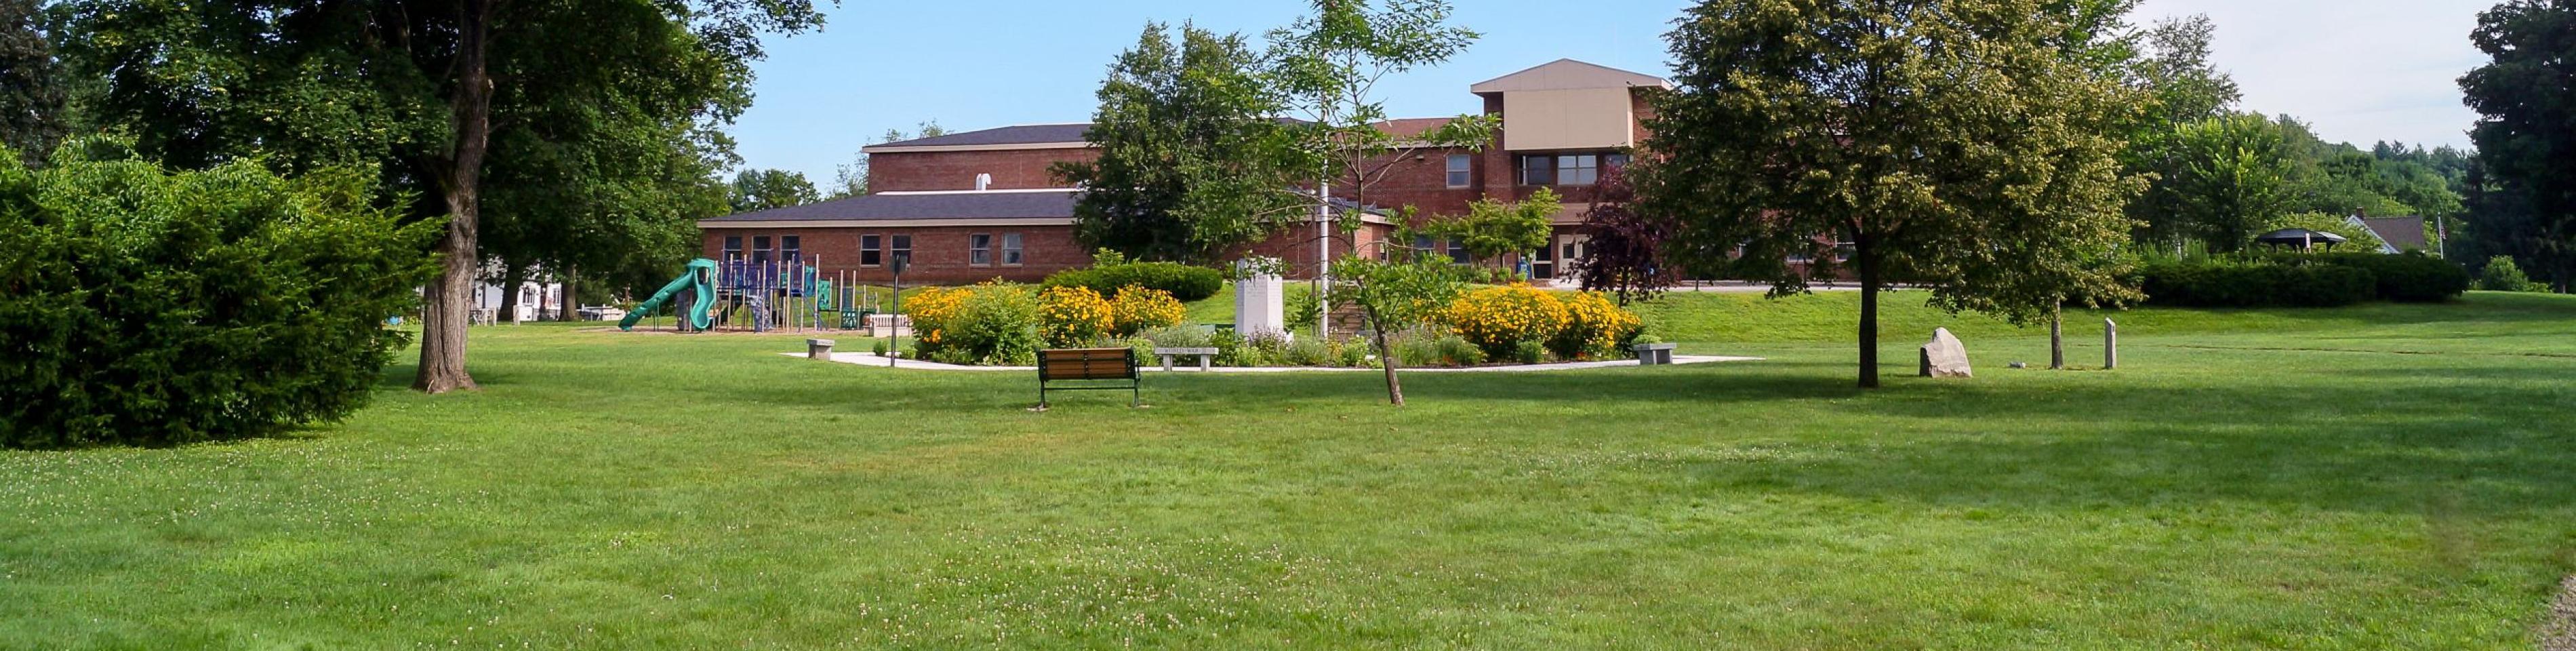 Recreation Center - Ward 2